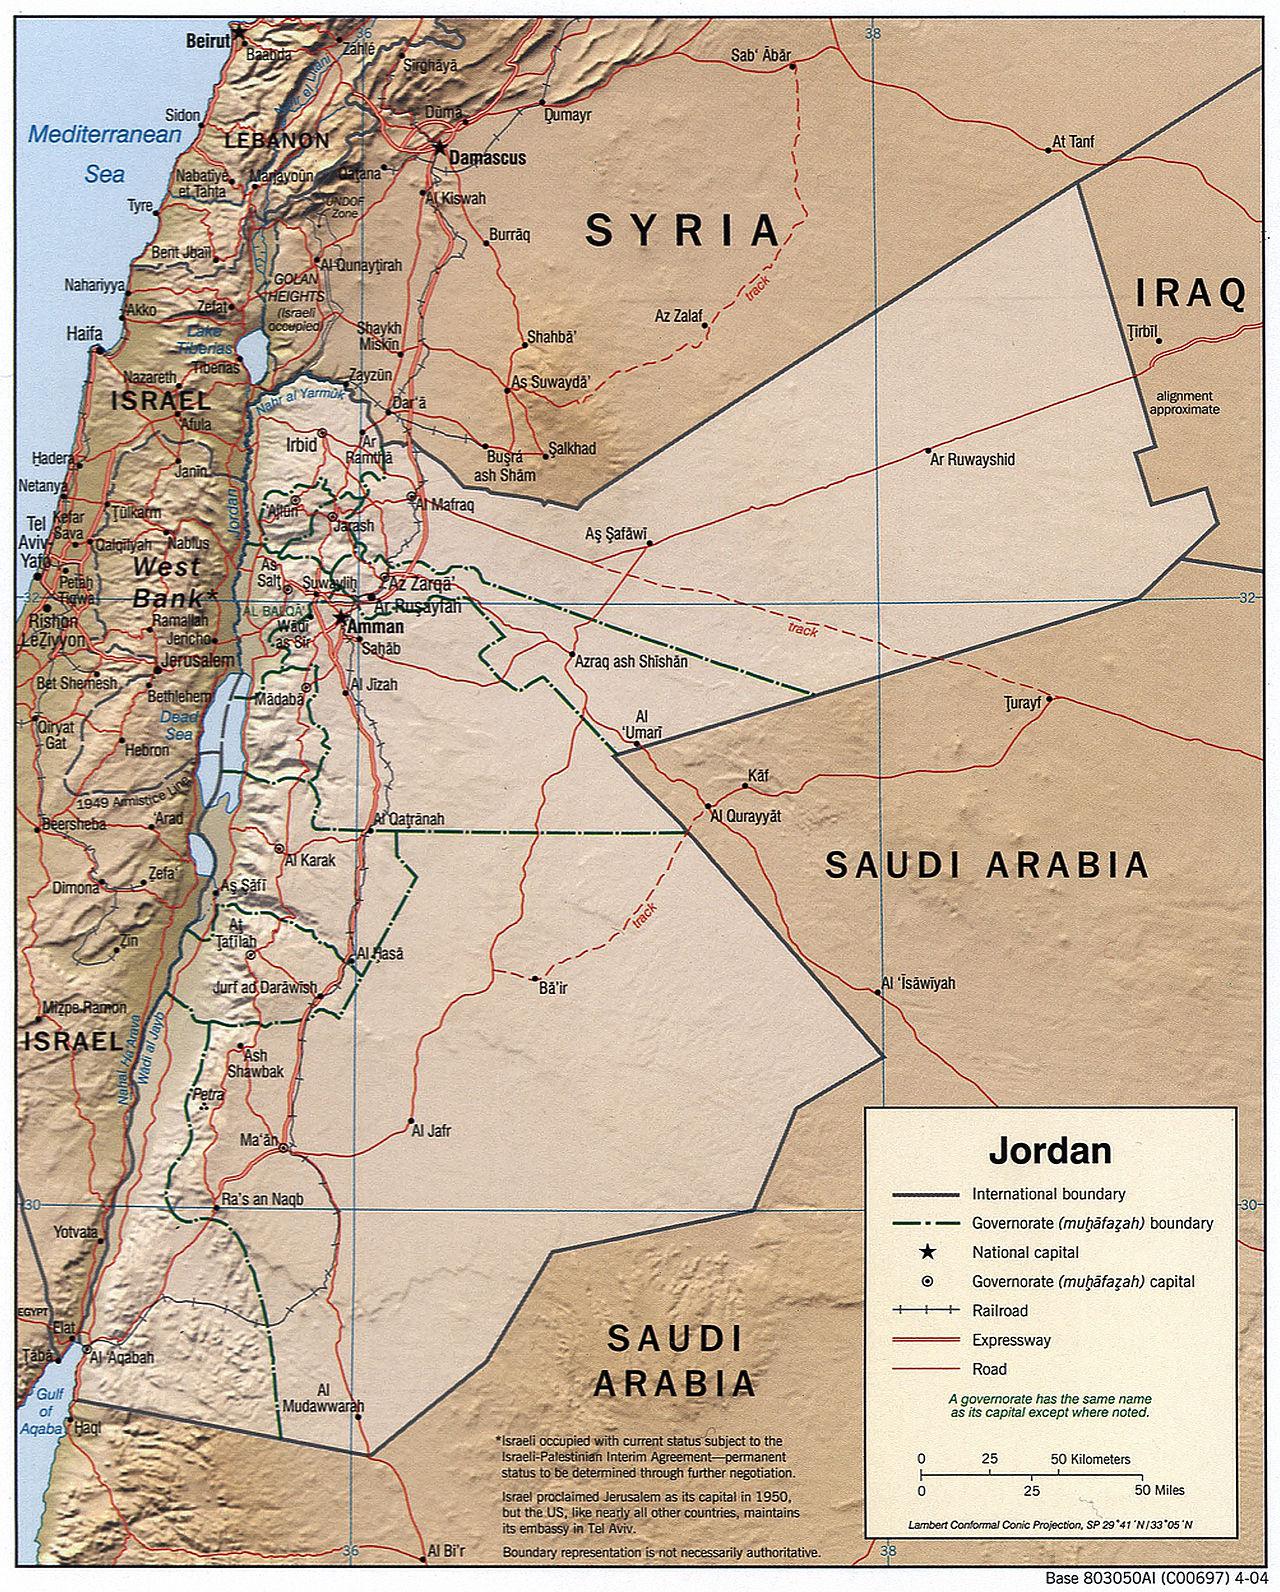 Jordan uses internet throttling instead of internet shutdowns and blocks to censor websites